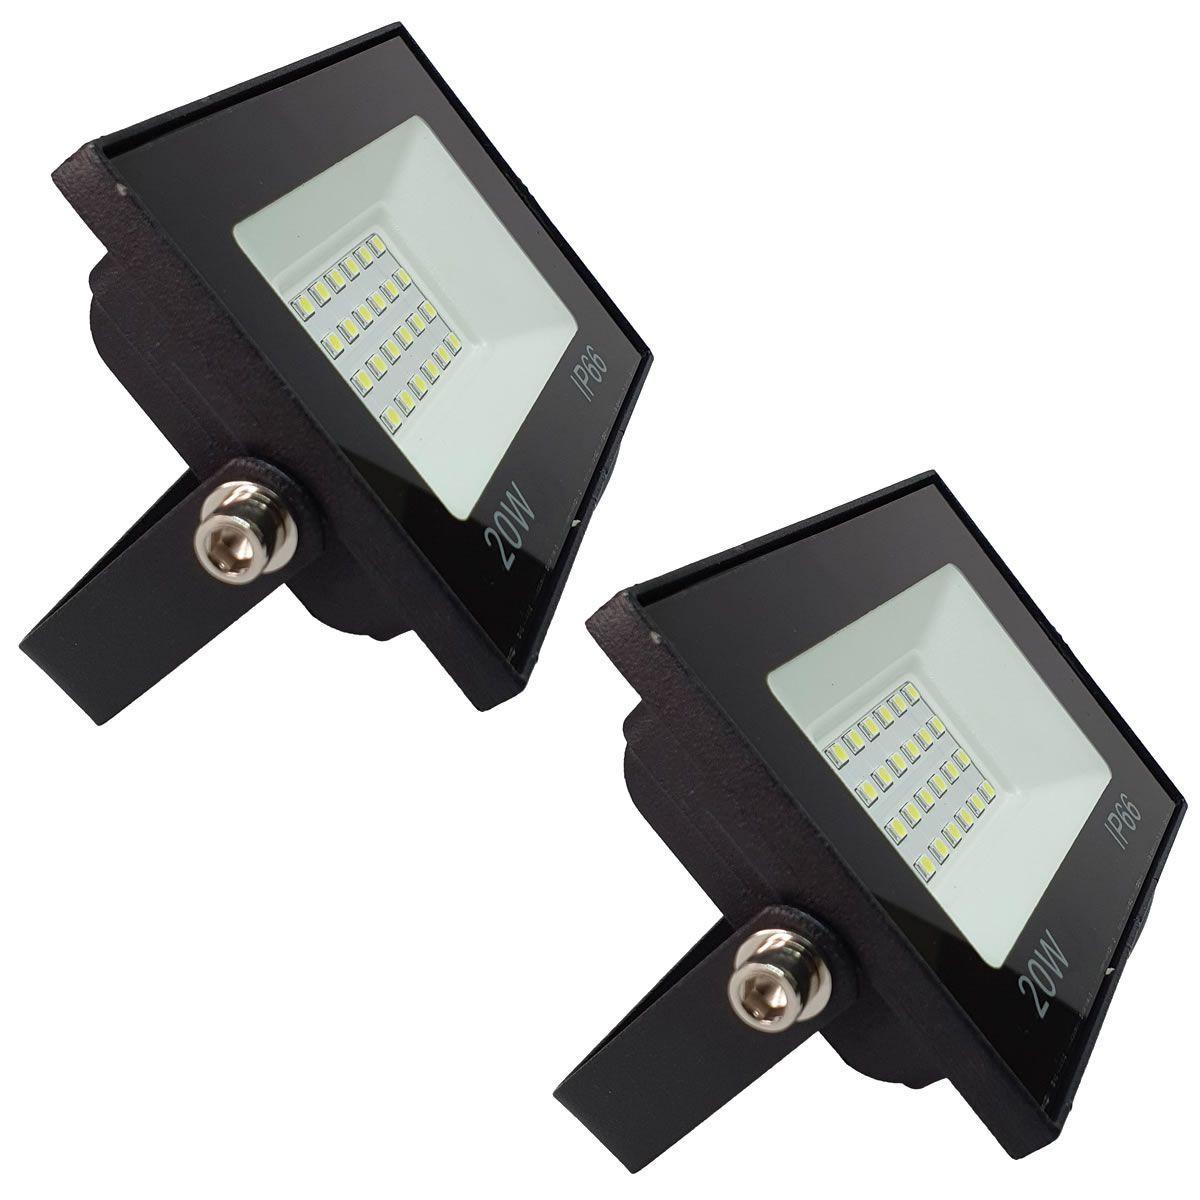 KIT 2 refletor 20w LED SMD Holofote Bivolt Externo Luz Branca